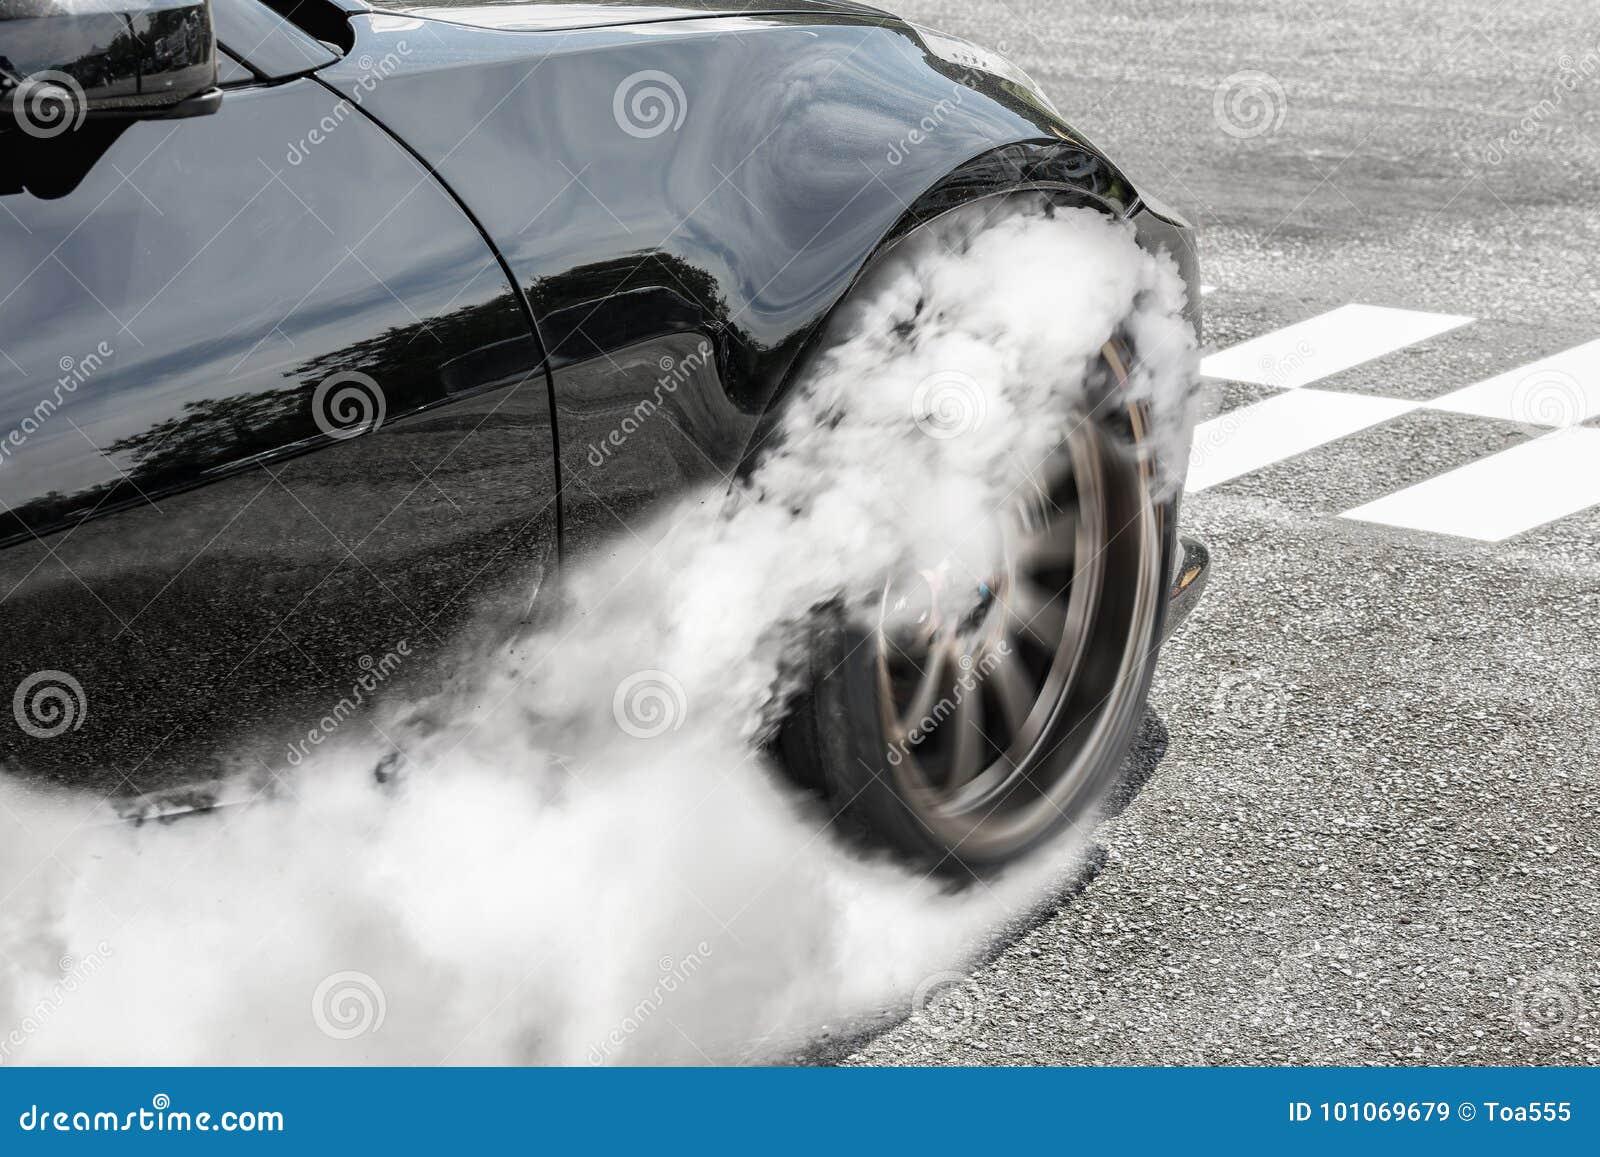 Drag racing car burns tires at start line.